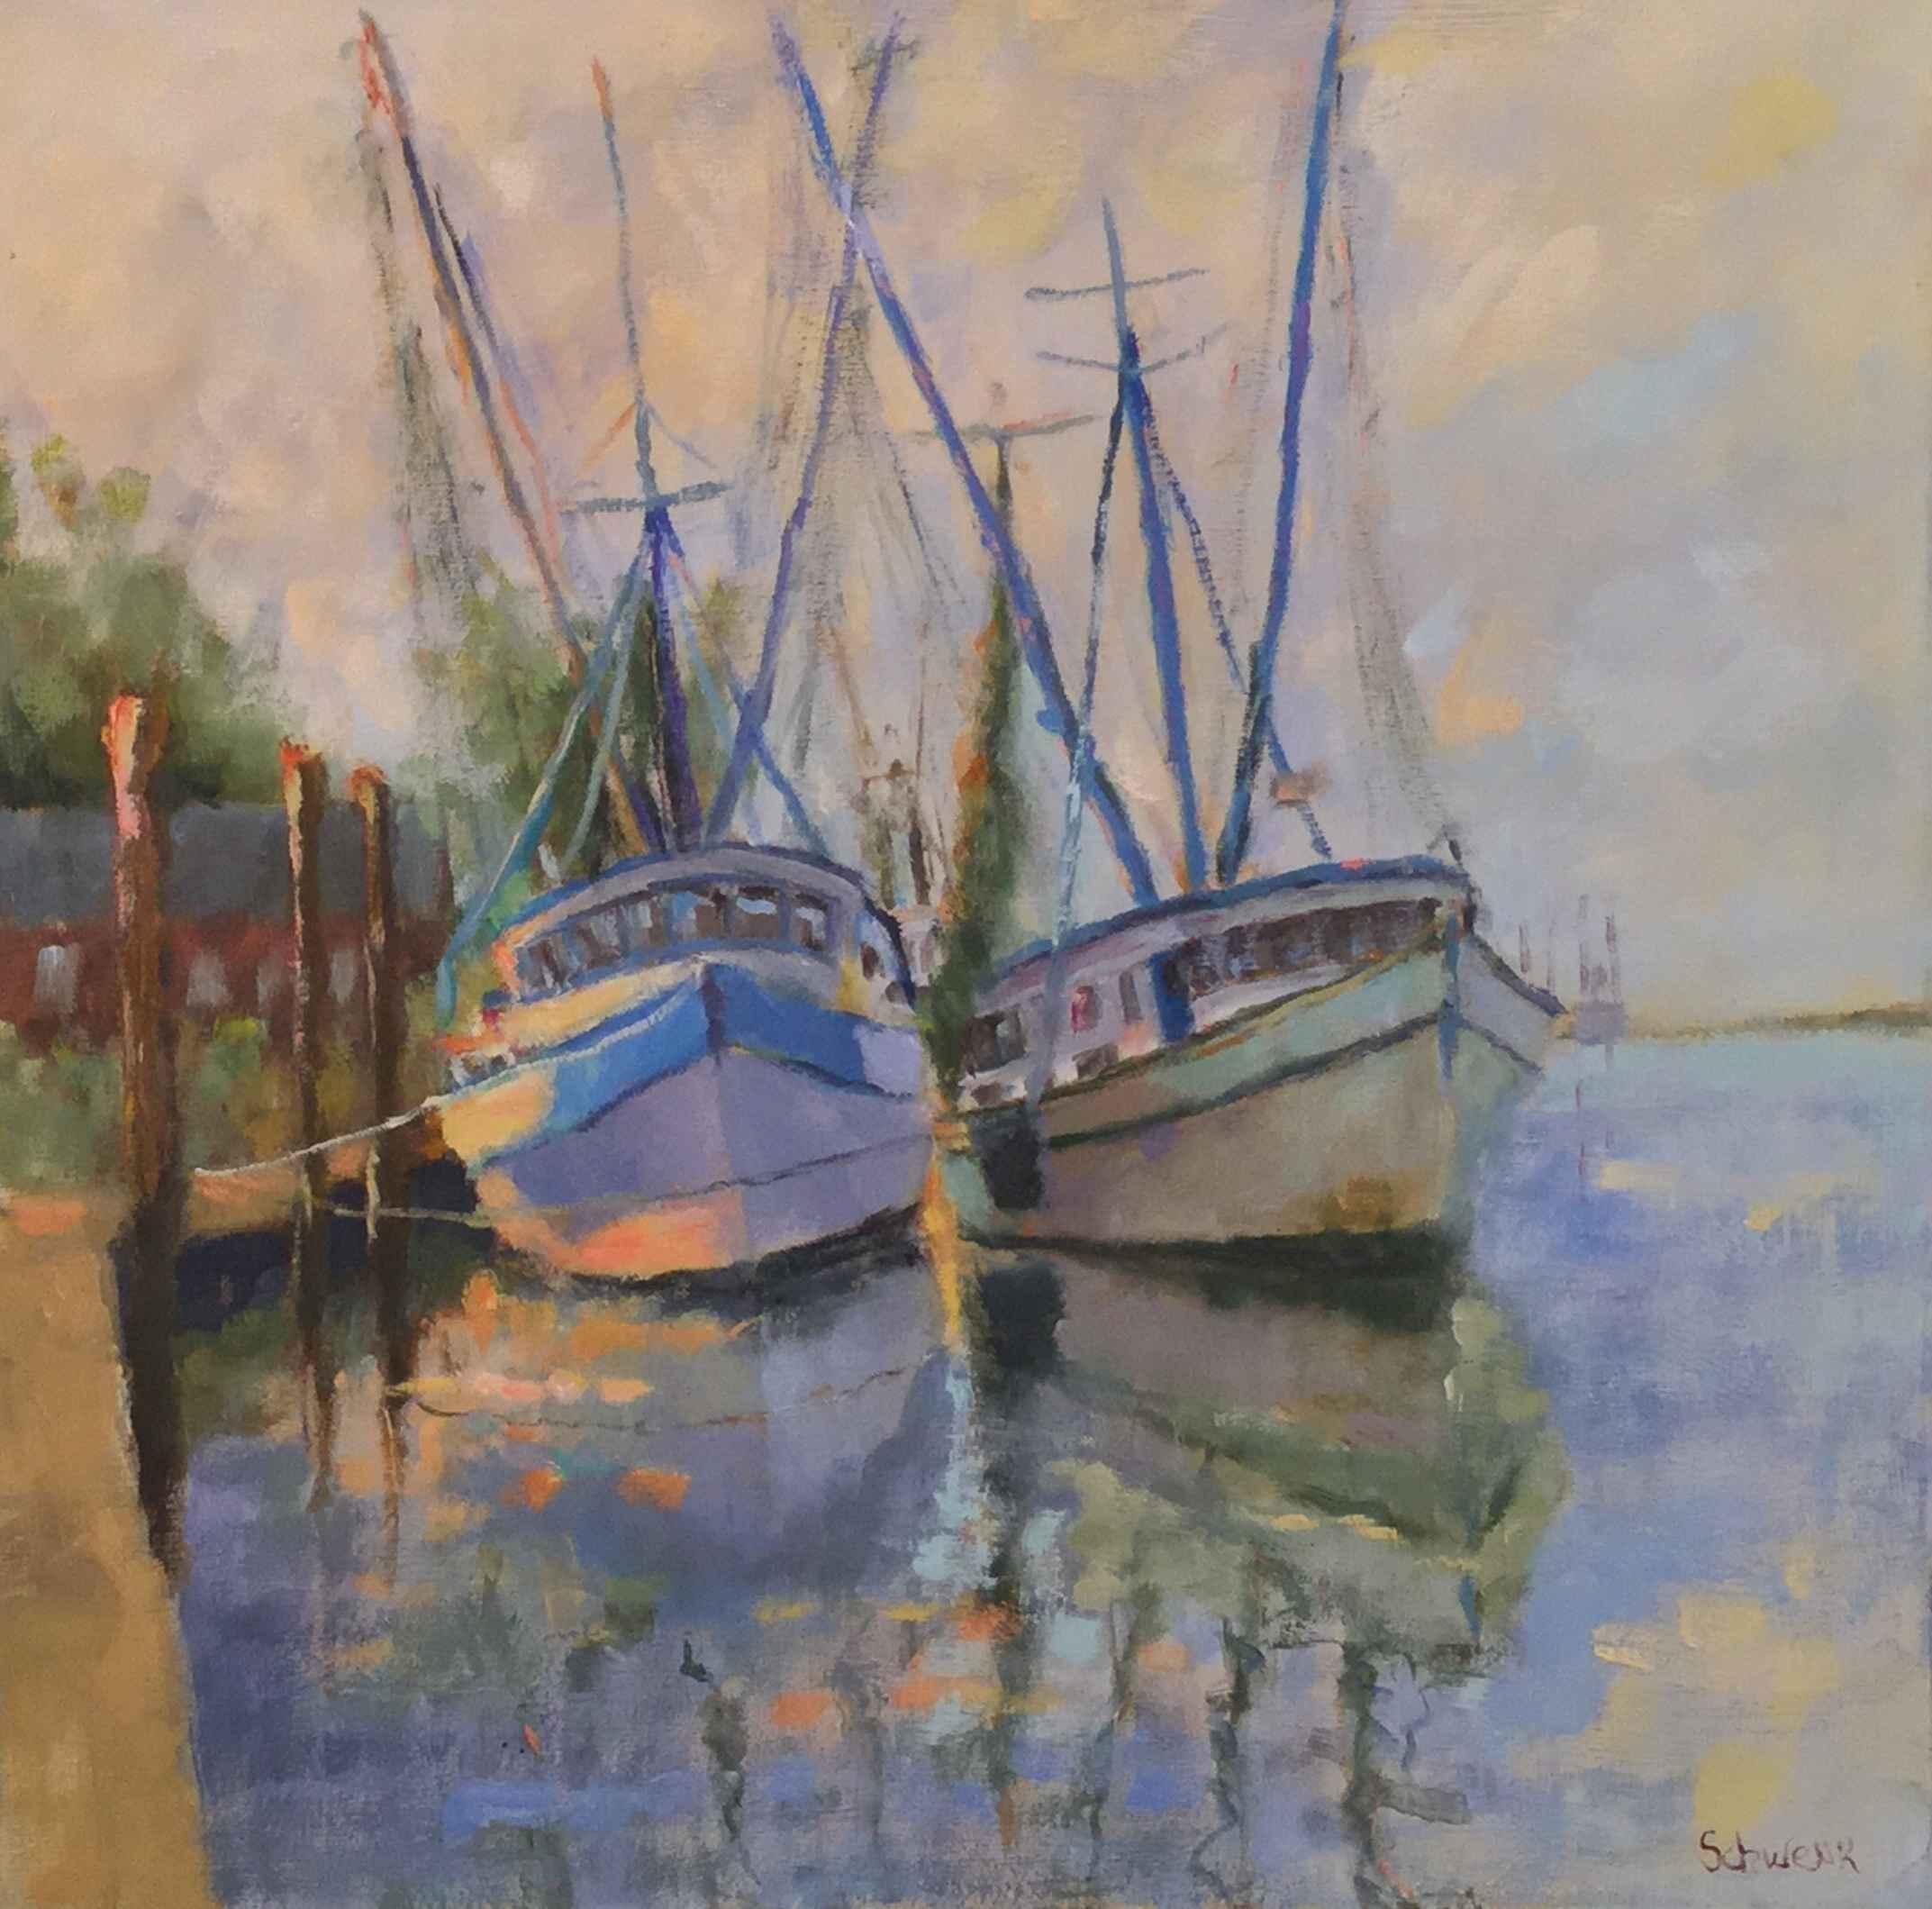 Shore Leave by  Sharon Schwenk - Masterpiece Online